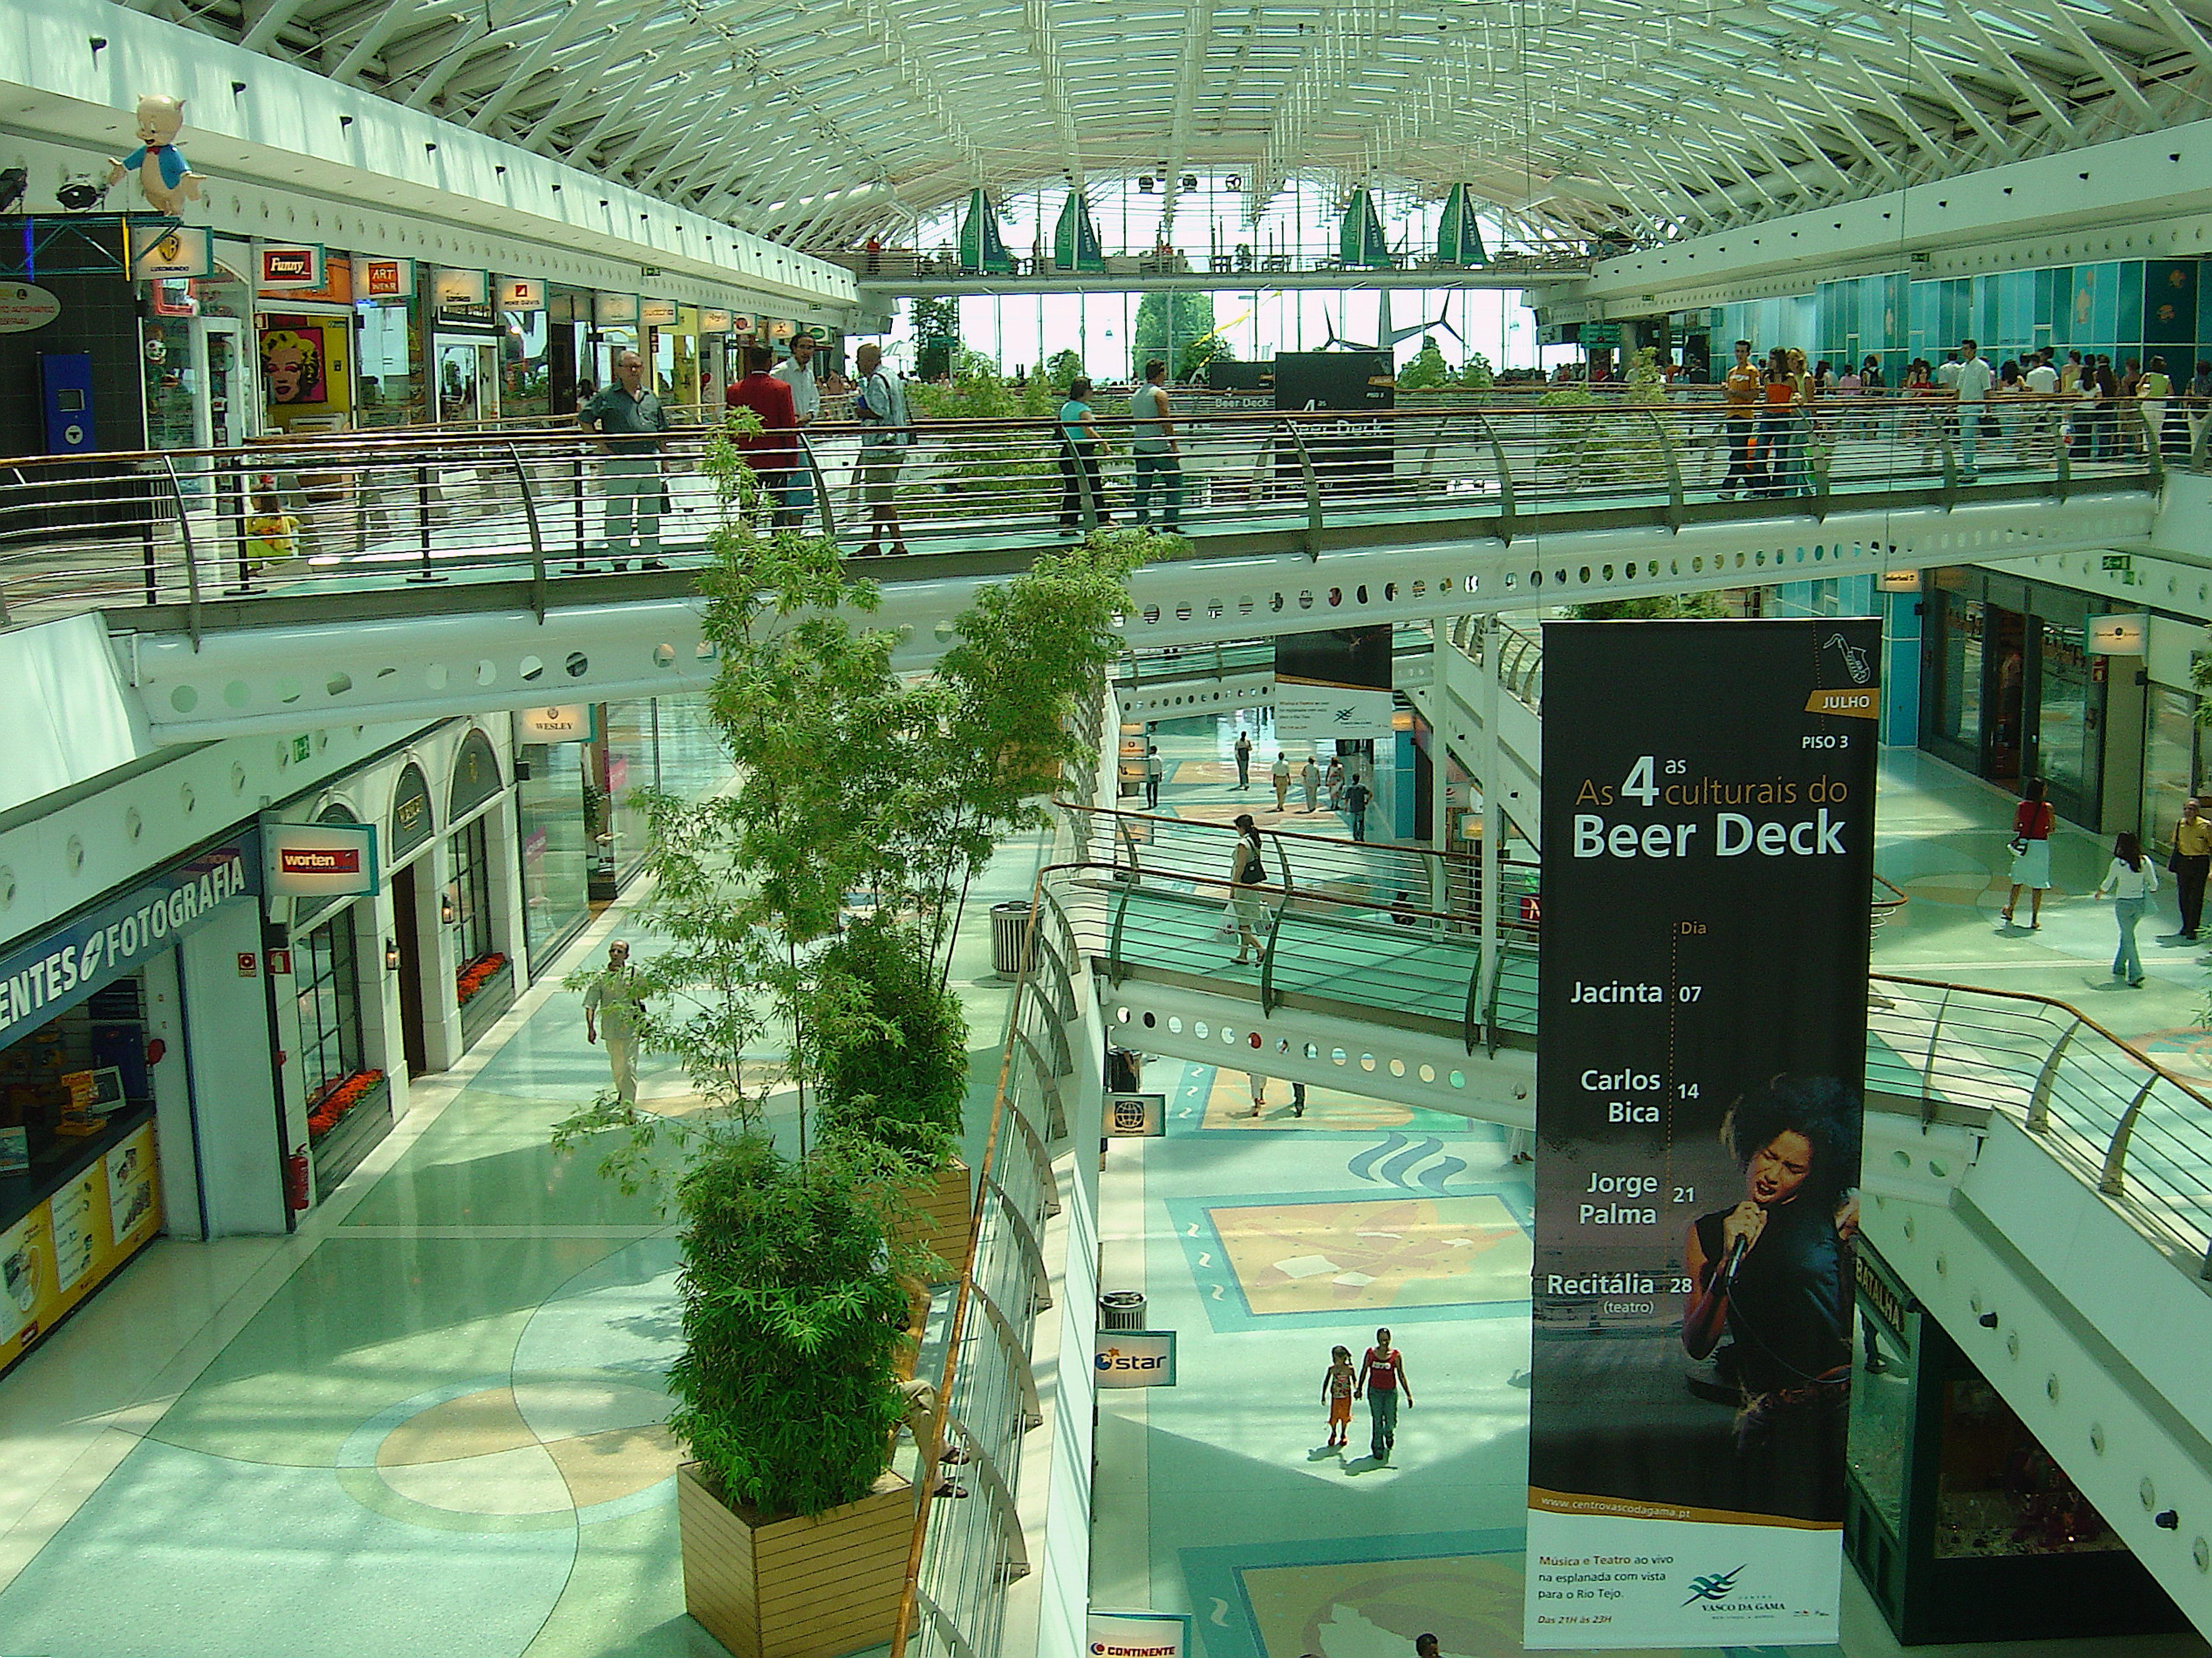 Filecentro comercial vasco da gama lisboa portugalg filecentro comercial vasco da gama lisboa portugalg sciox Gallery